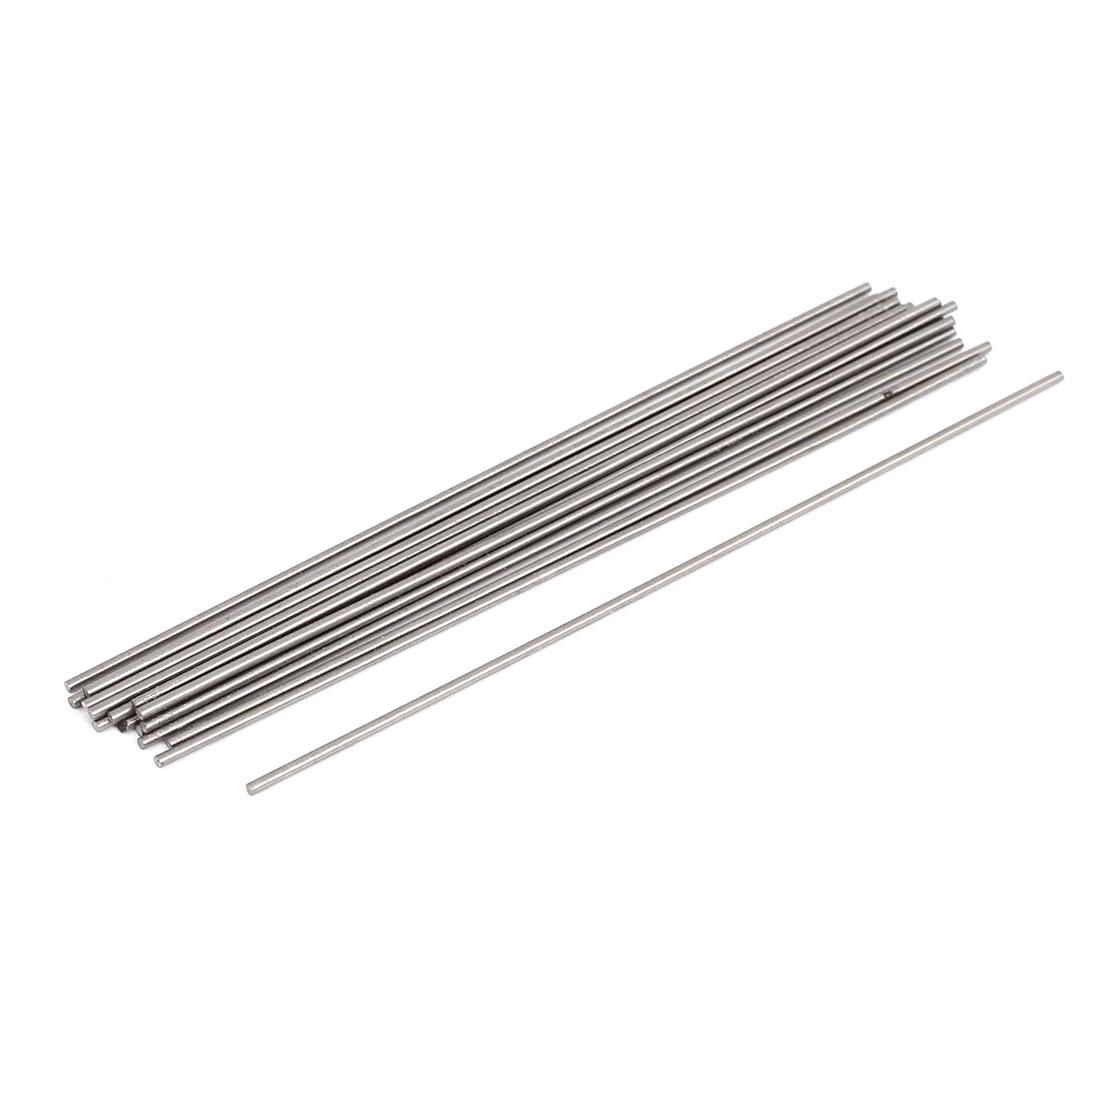 Machine Grooving Tool Steel Lathe Bars Round Stock 1.2mmx100mm 20 Pcs